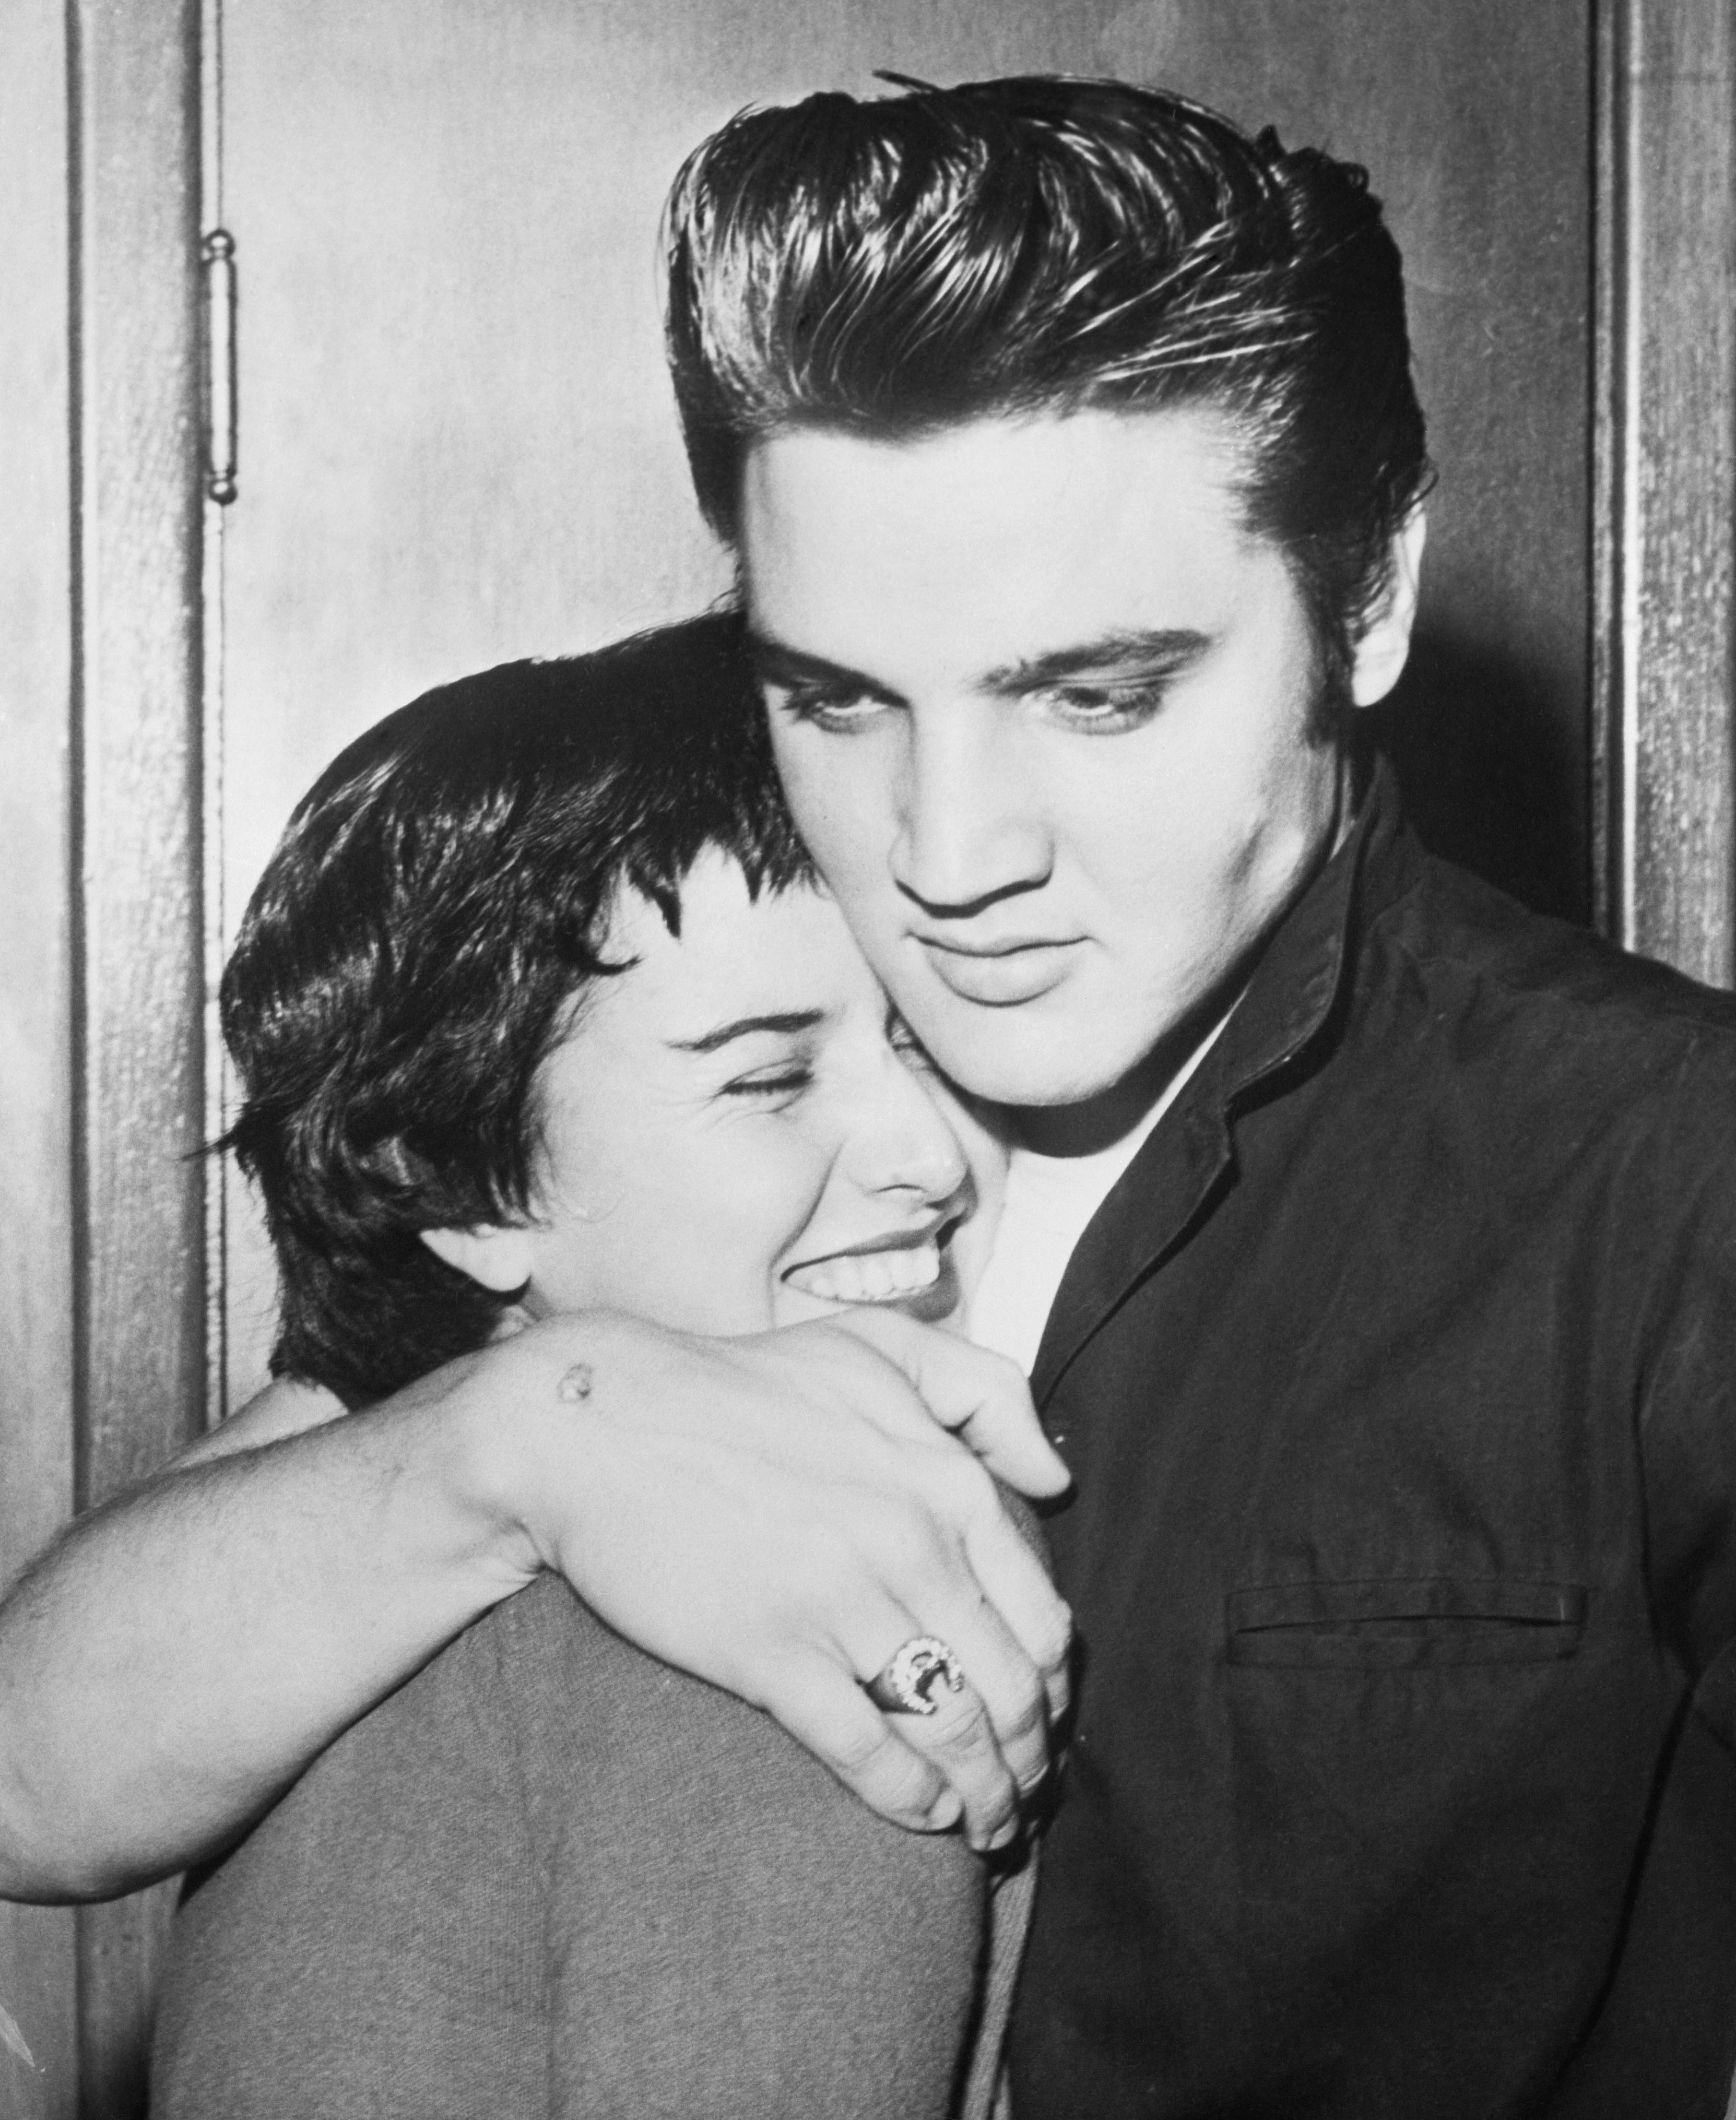 Элвис Пресли обнимает June Janico - фото с большим разрешением